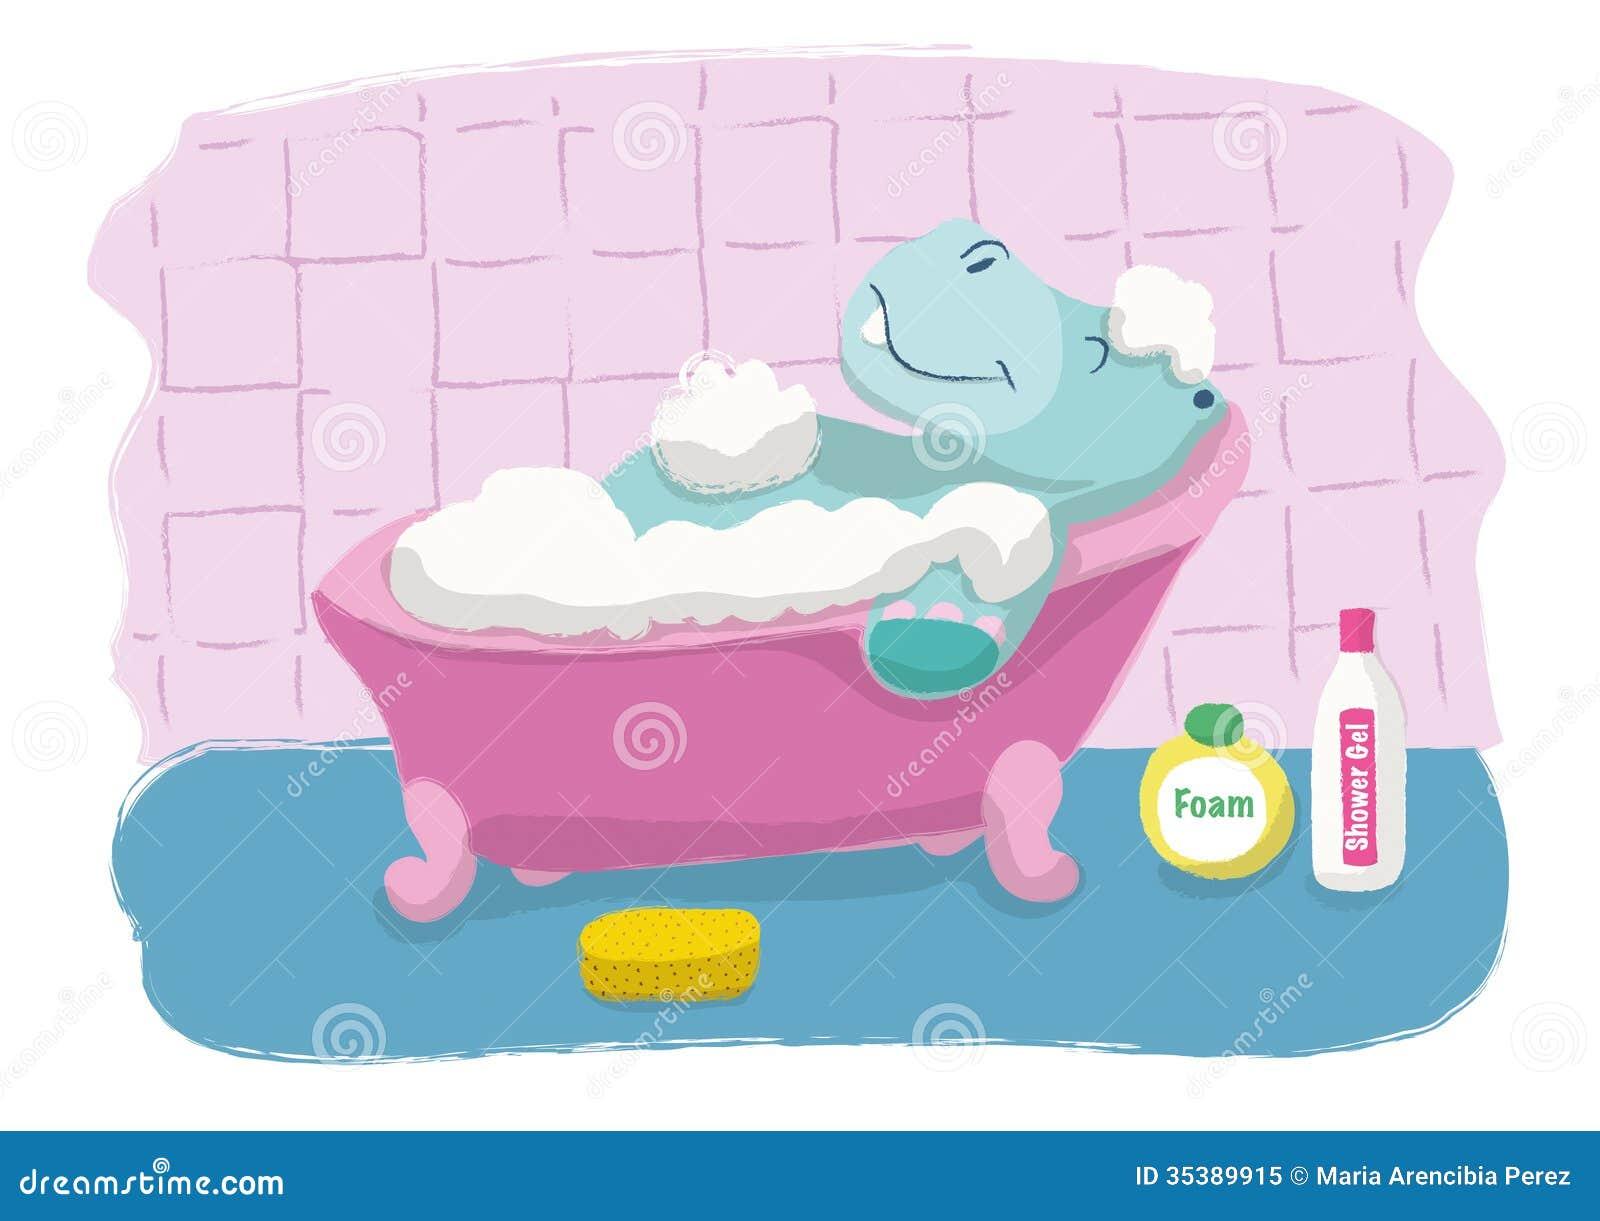 Shower Gel As Bubble Bath Hippopotamus Bath Royalty Free Stock Photo Image 35389915